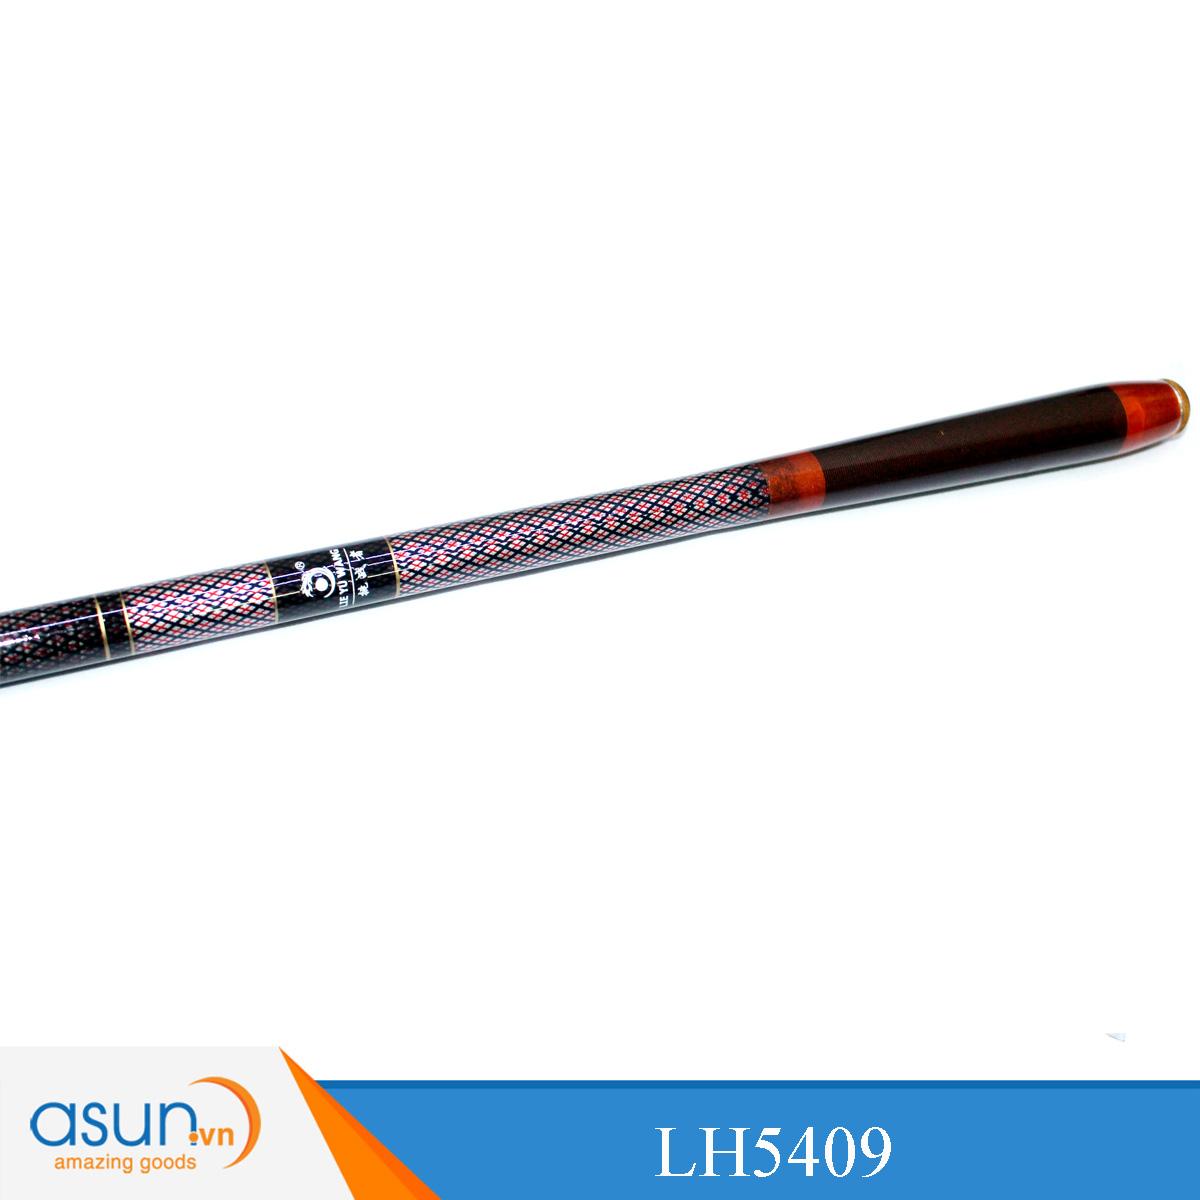 Cần Câu Tay Lei Yu Wang LeiHuo 5409 - 5m4 Cần câu chính hãng